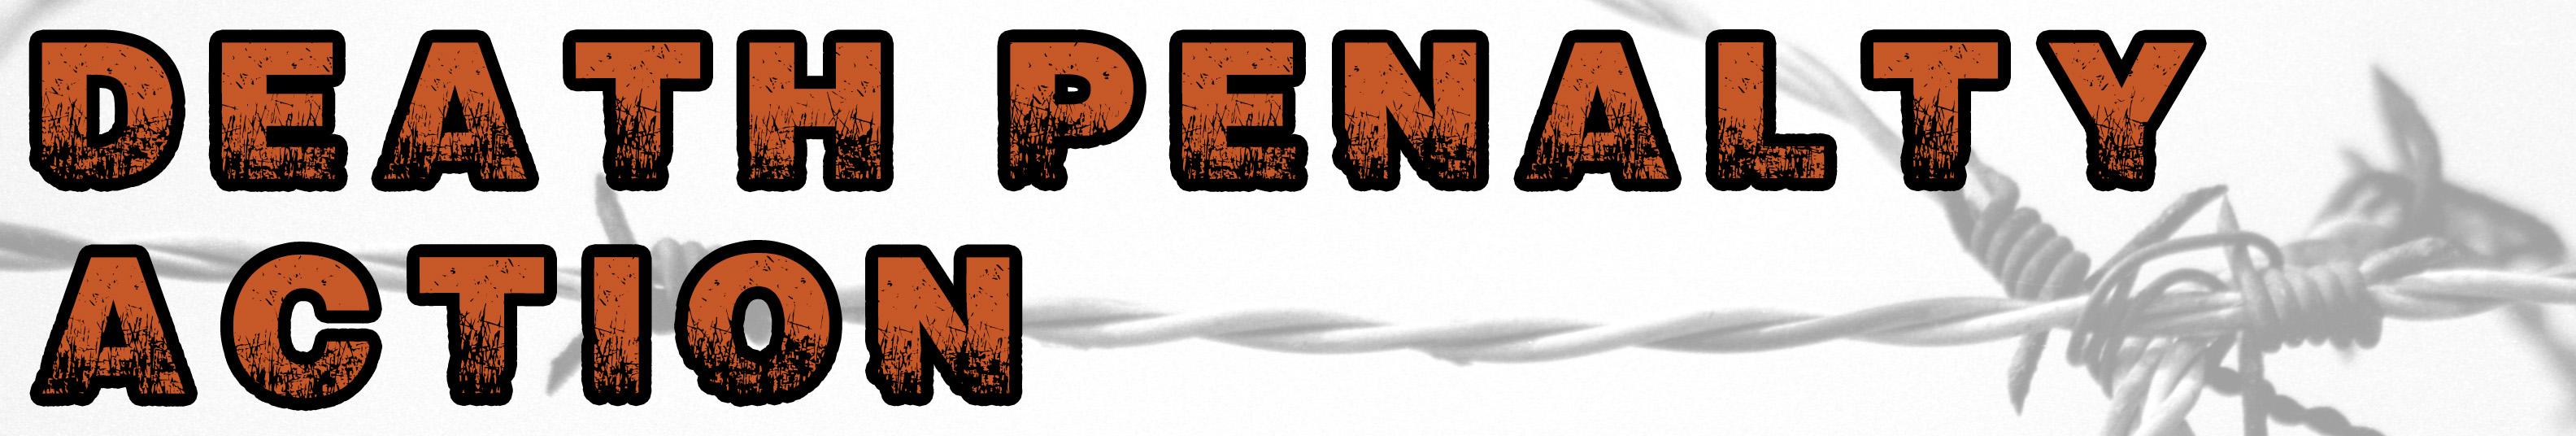 Open-uri20190629-8001-1mmpwi9